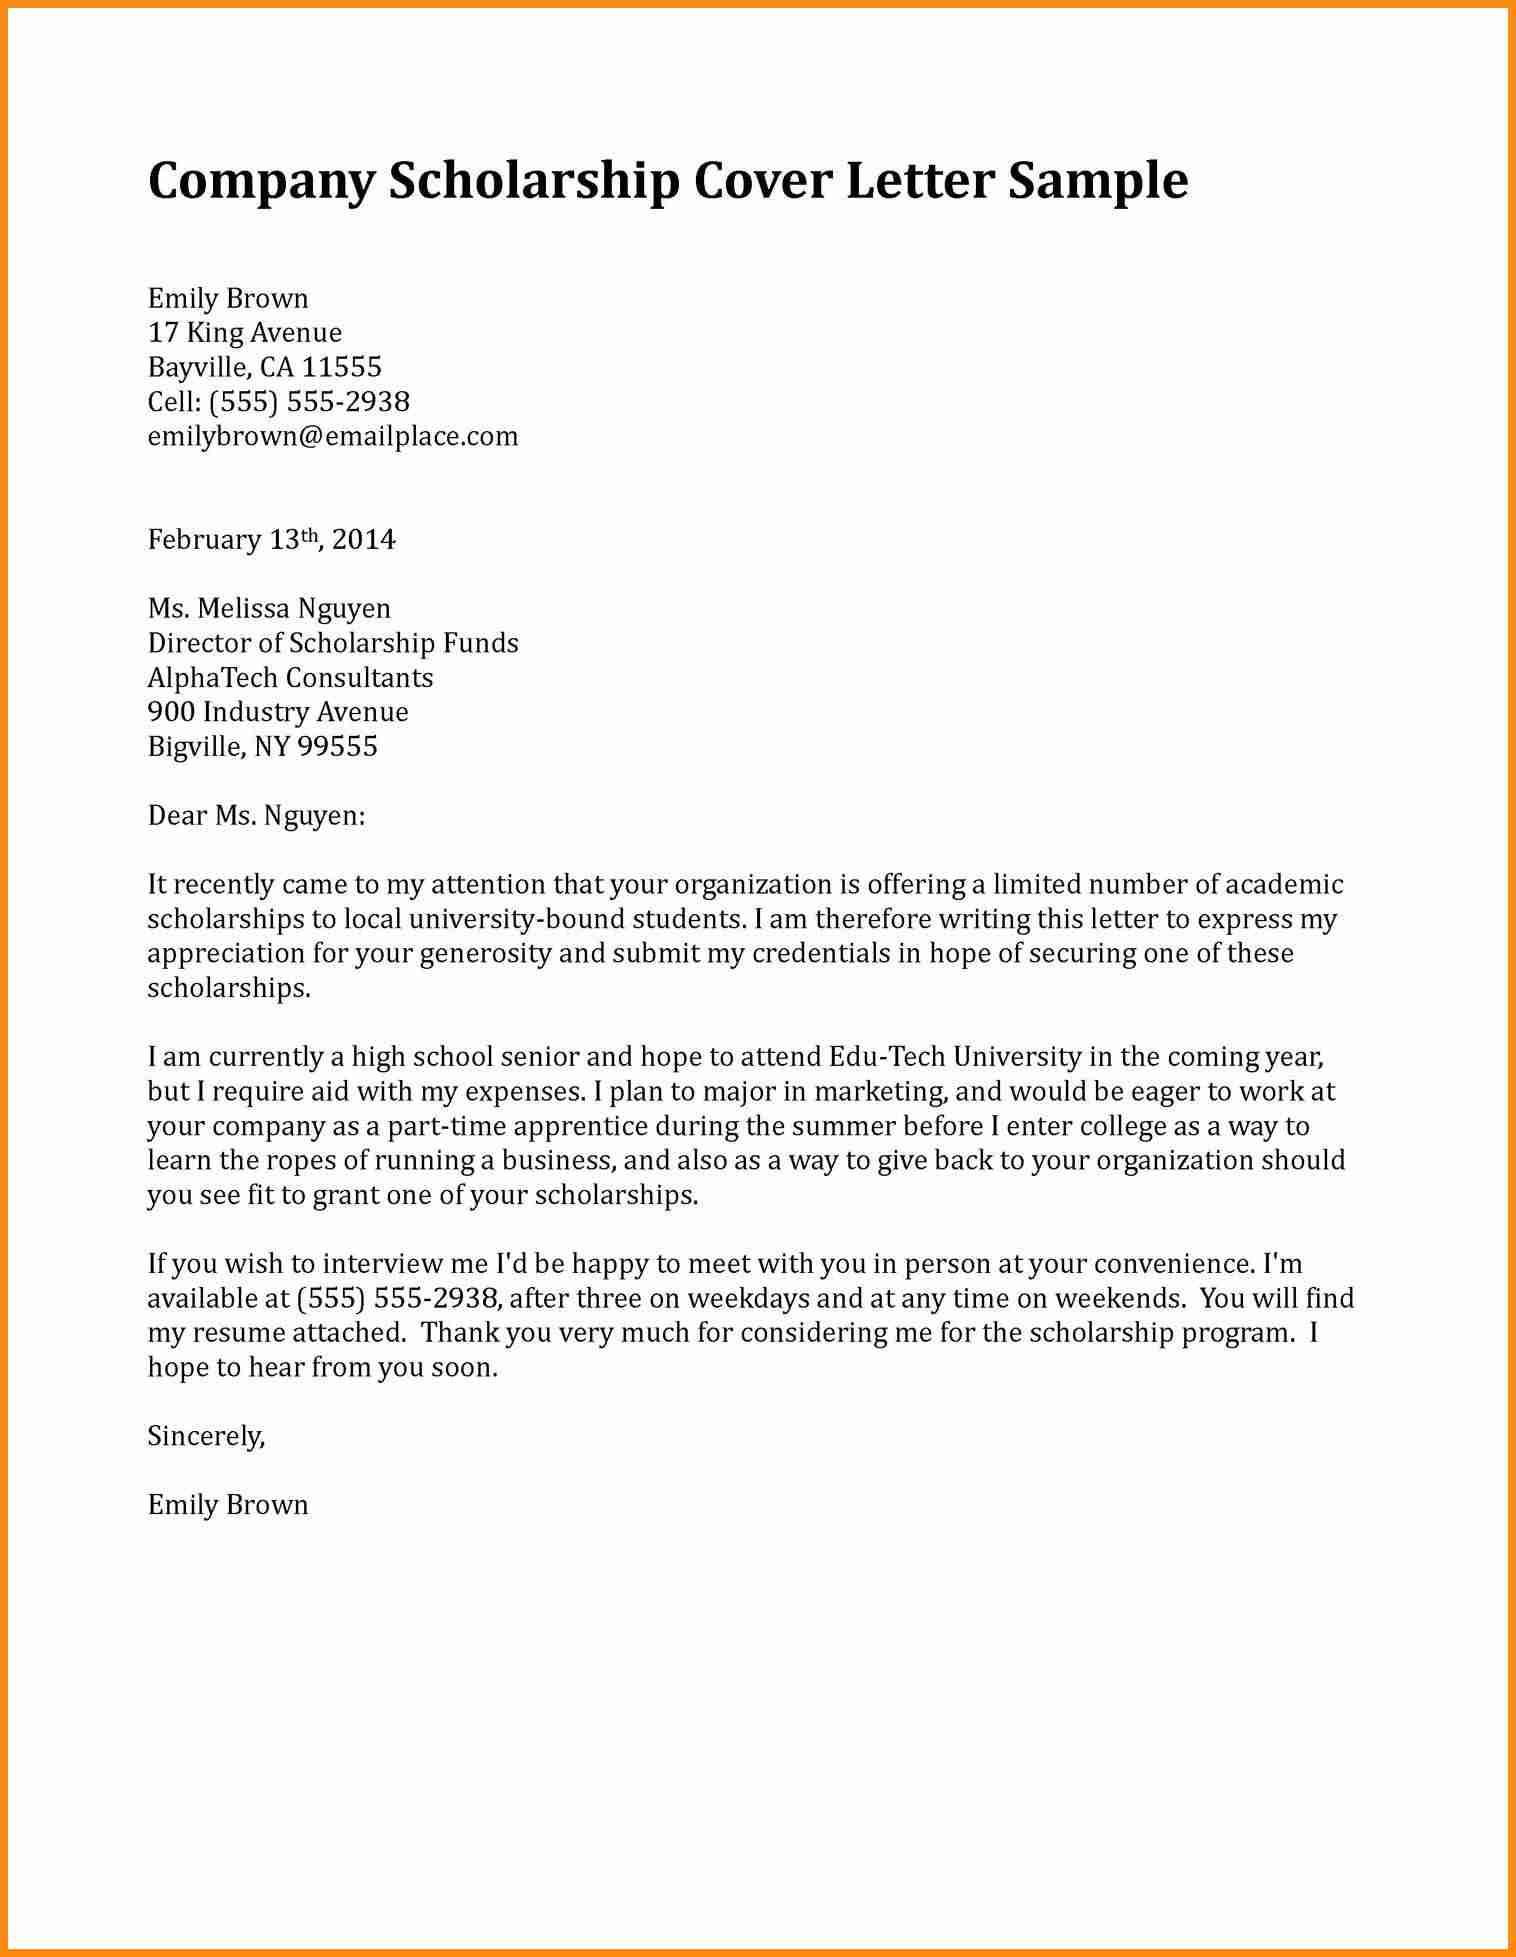 Motivation Letter for Scholarship Example